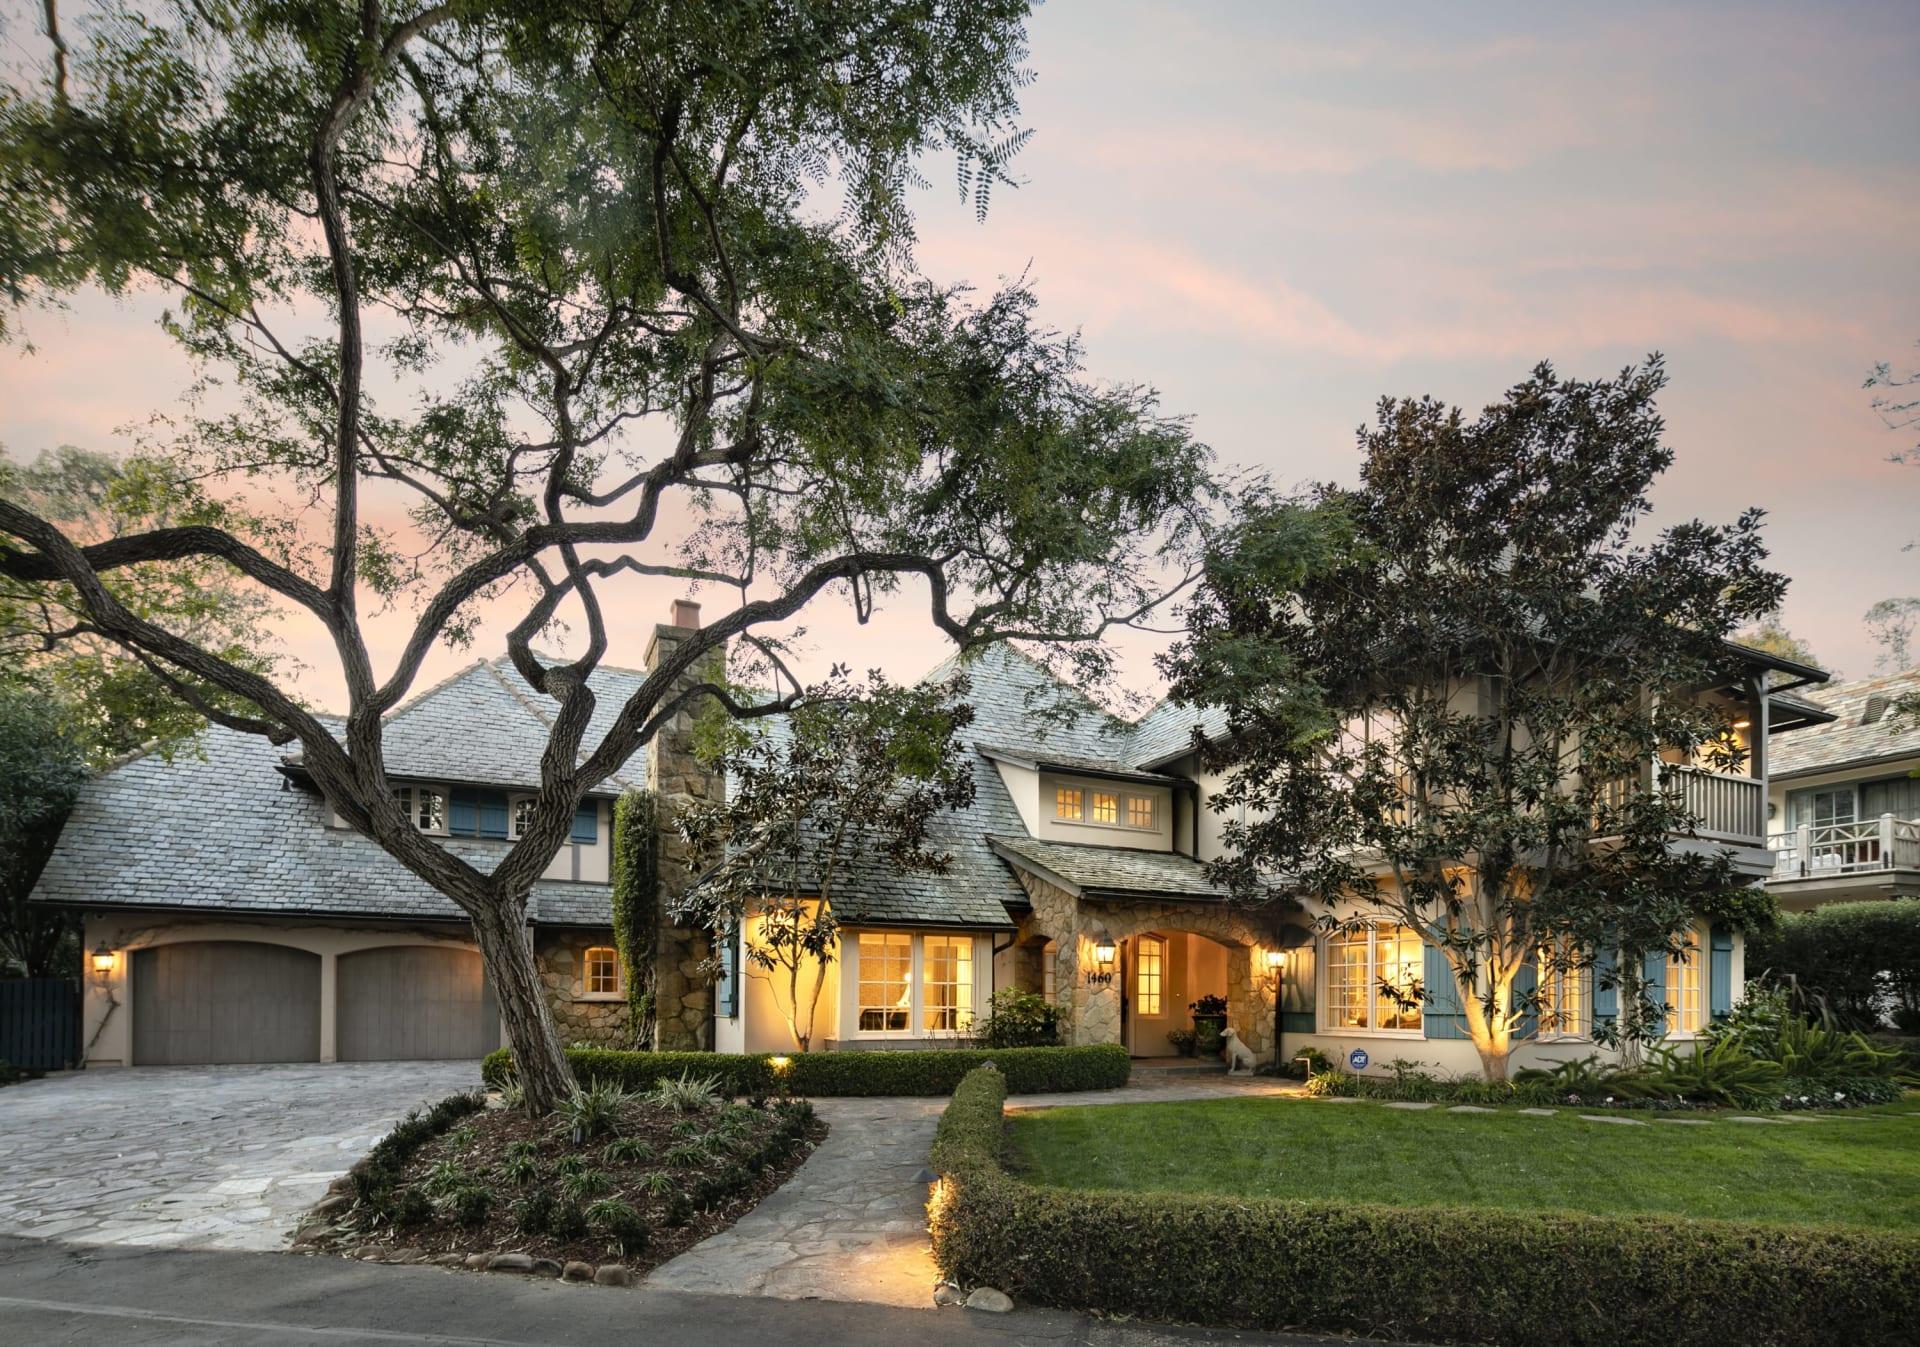 Making An Offer on Santa Barbara Real Estate